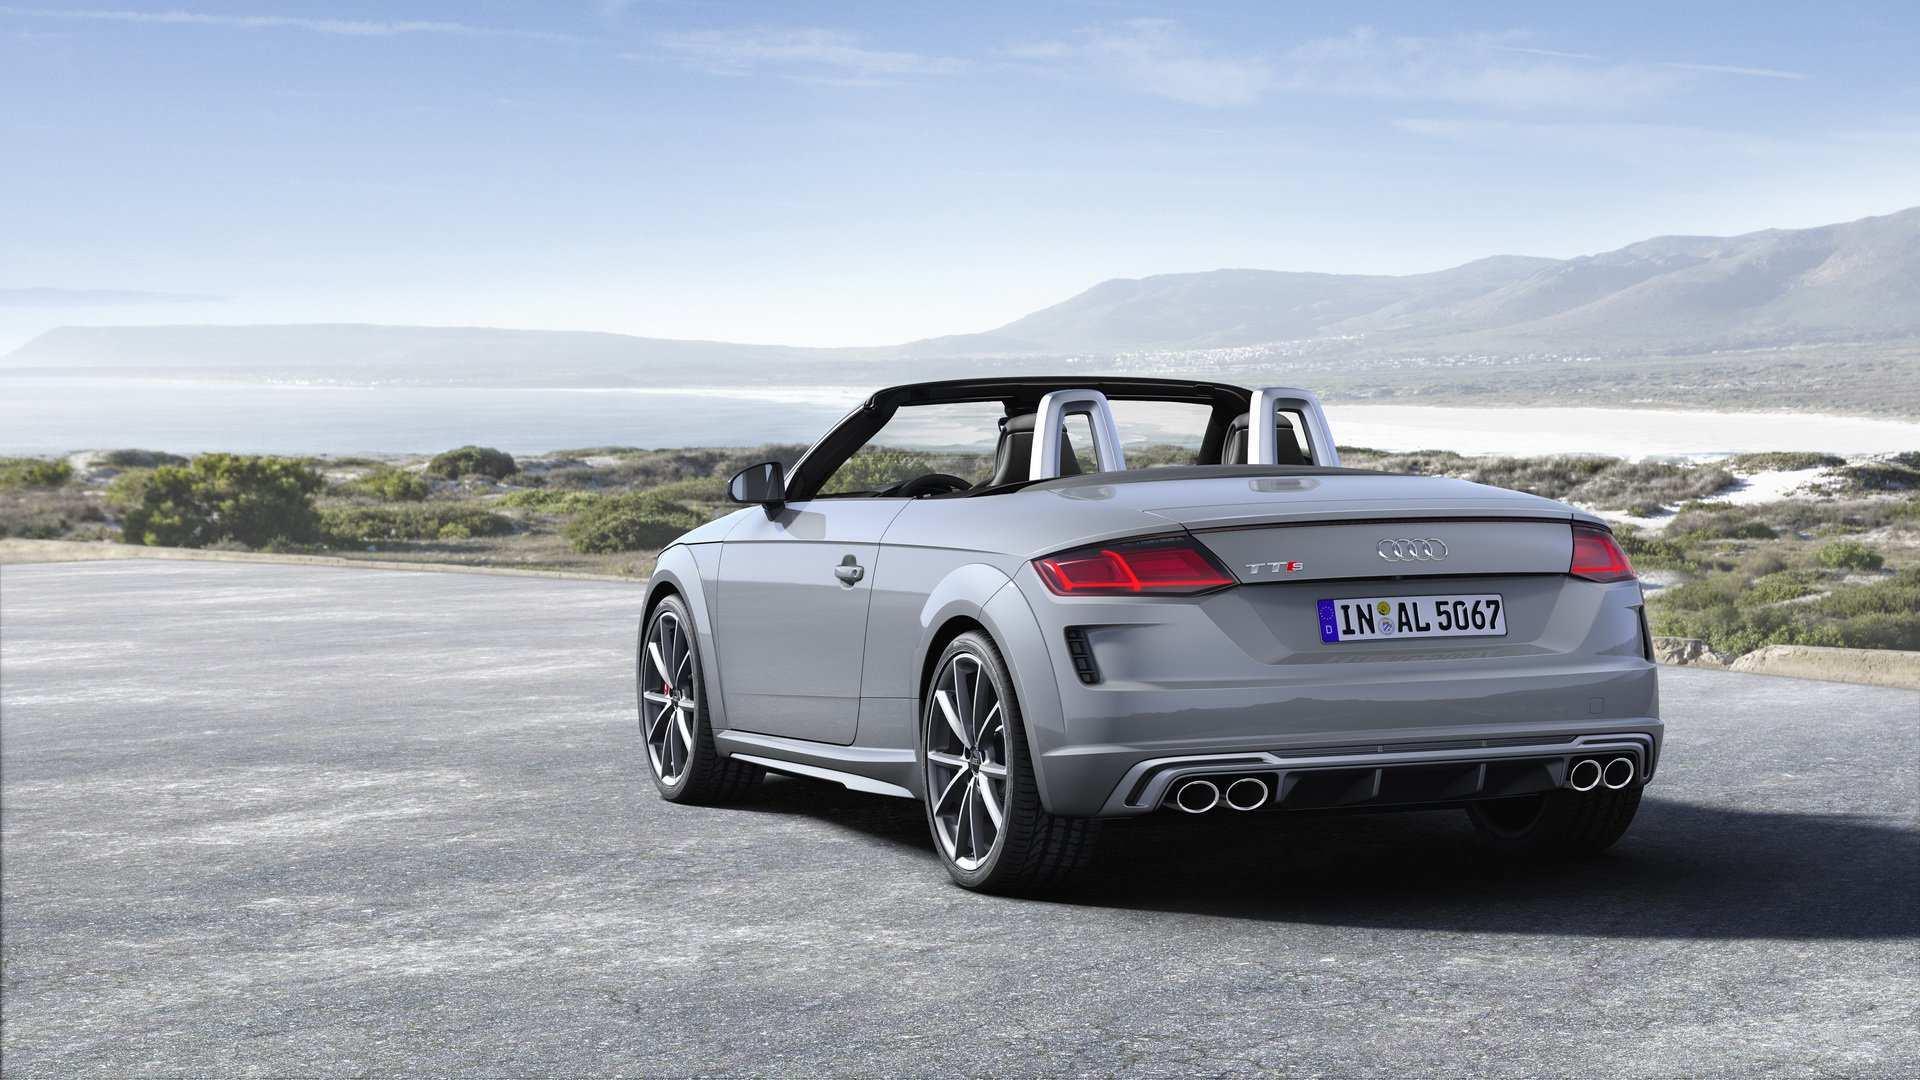 14 Concept of Audi Tt Convertible 2020 Overview by Audi Tt Convertible 2020